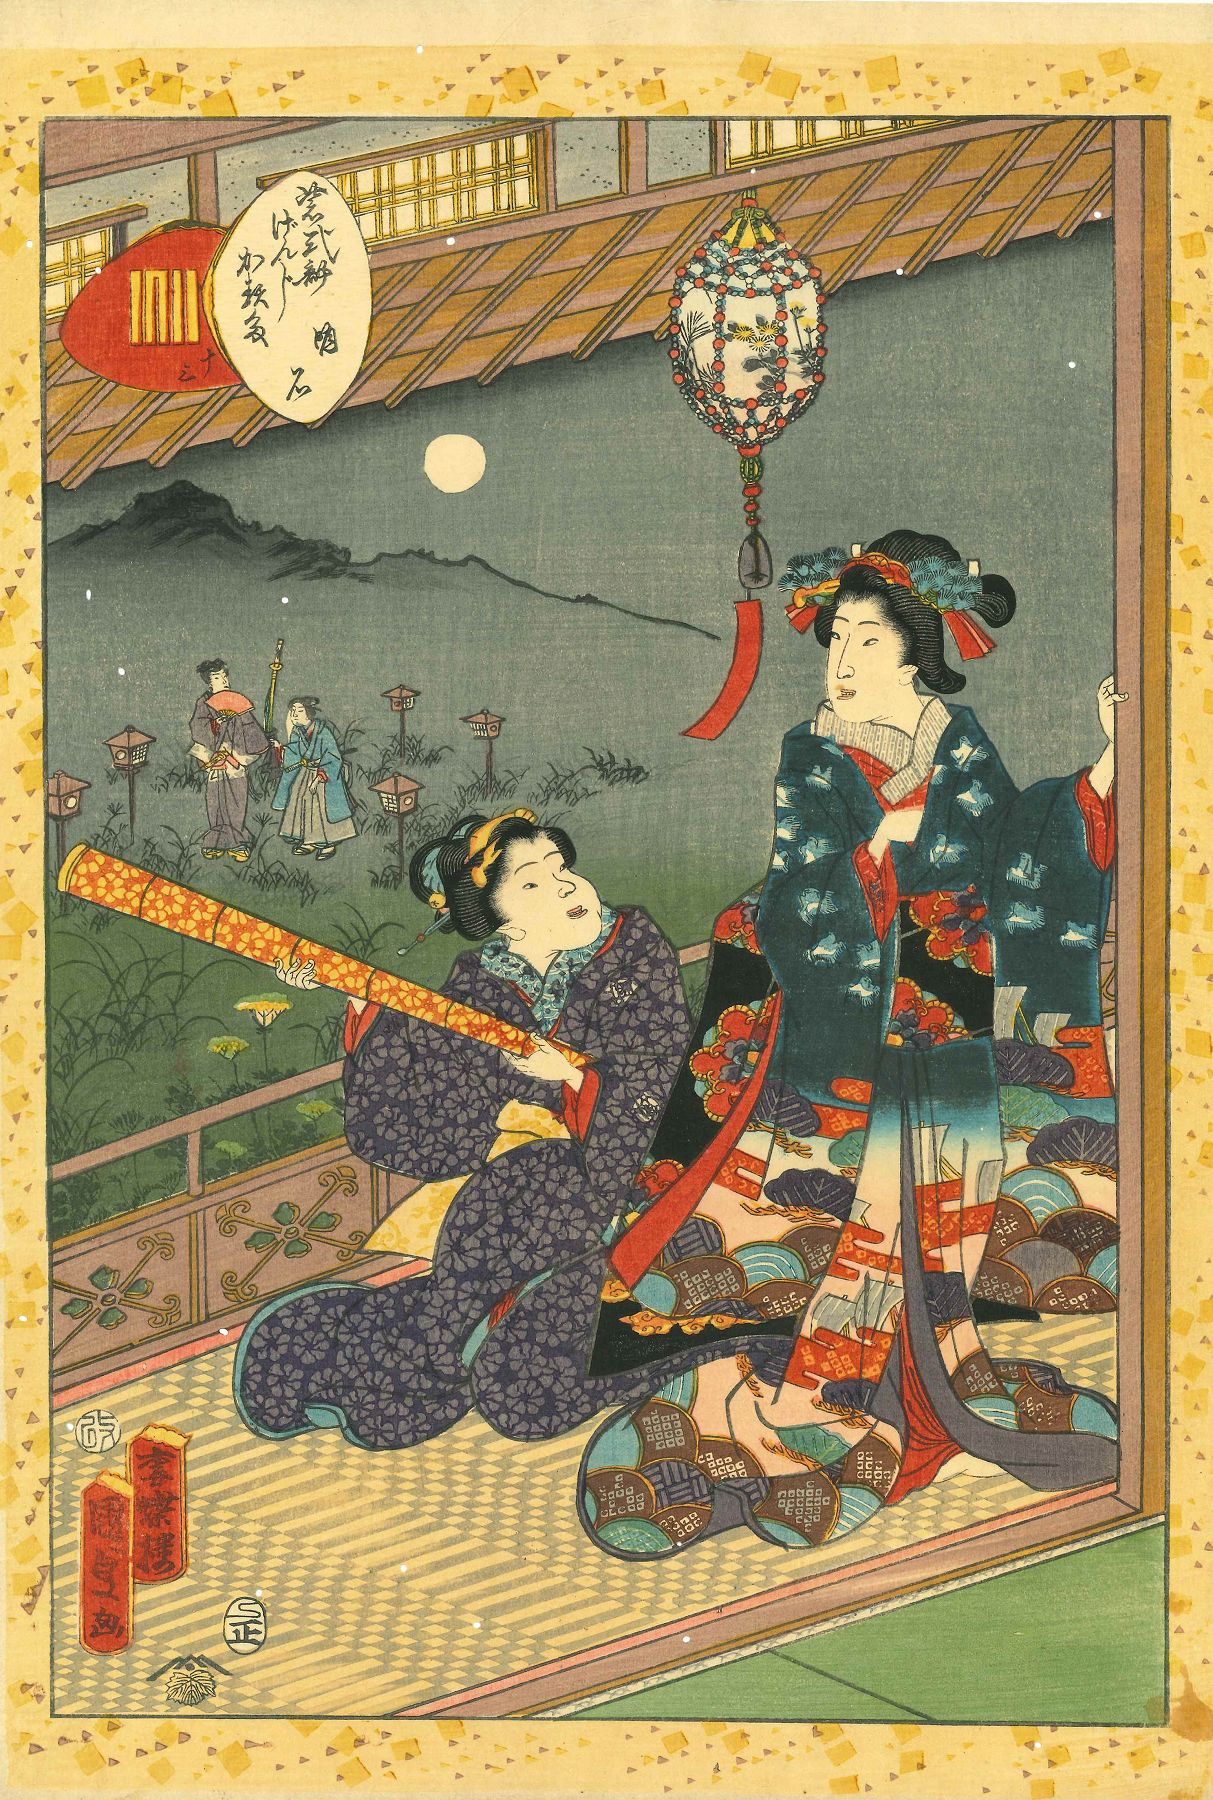 KUNISADA II <i>Akashi</i>, Chapter 13, from <i>Murasaki Shikibu Genji karuta</i> (Card game of the tale of Genji by Lady Murasaki)